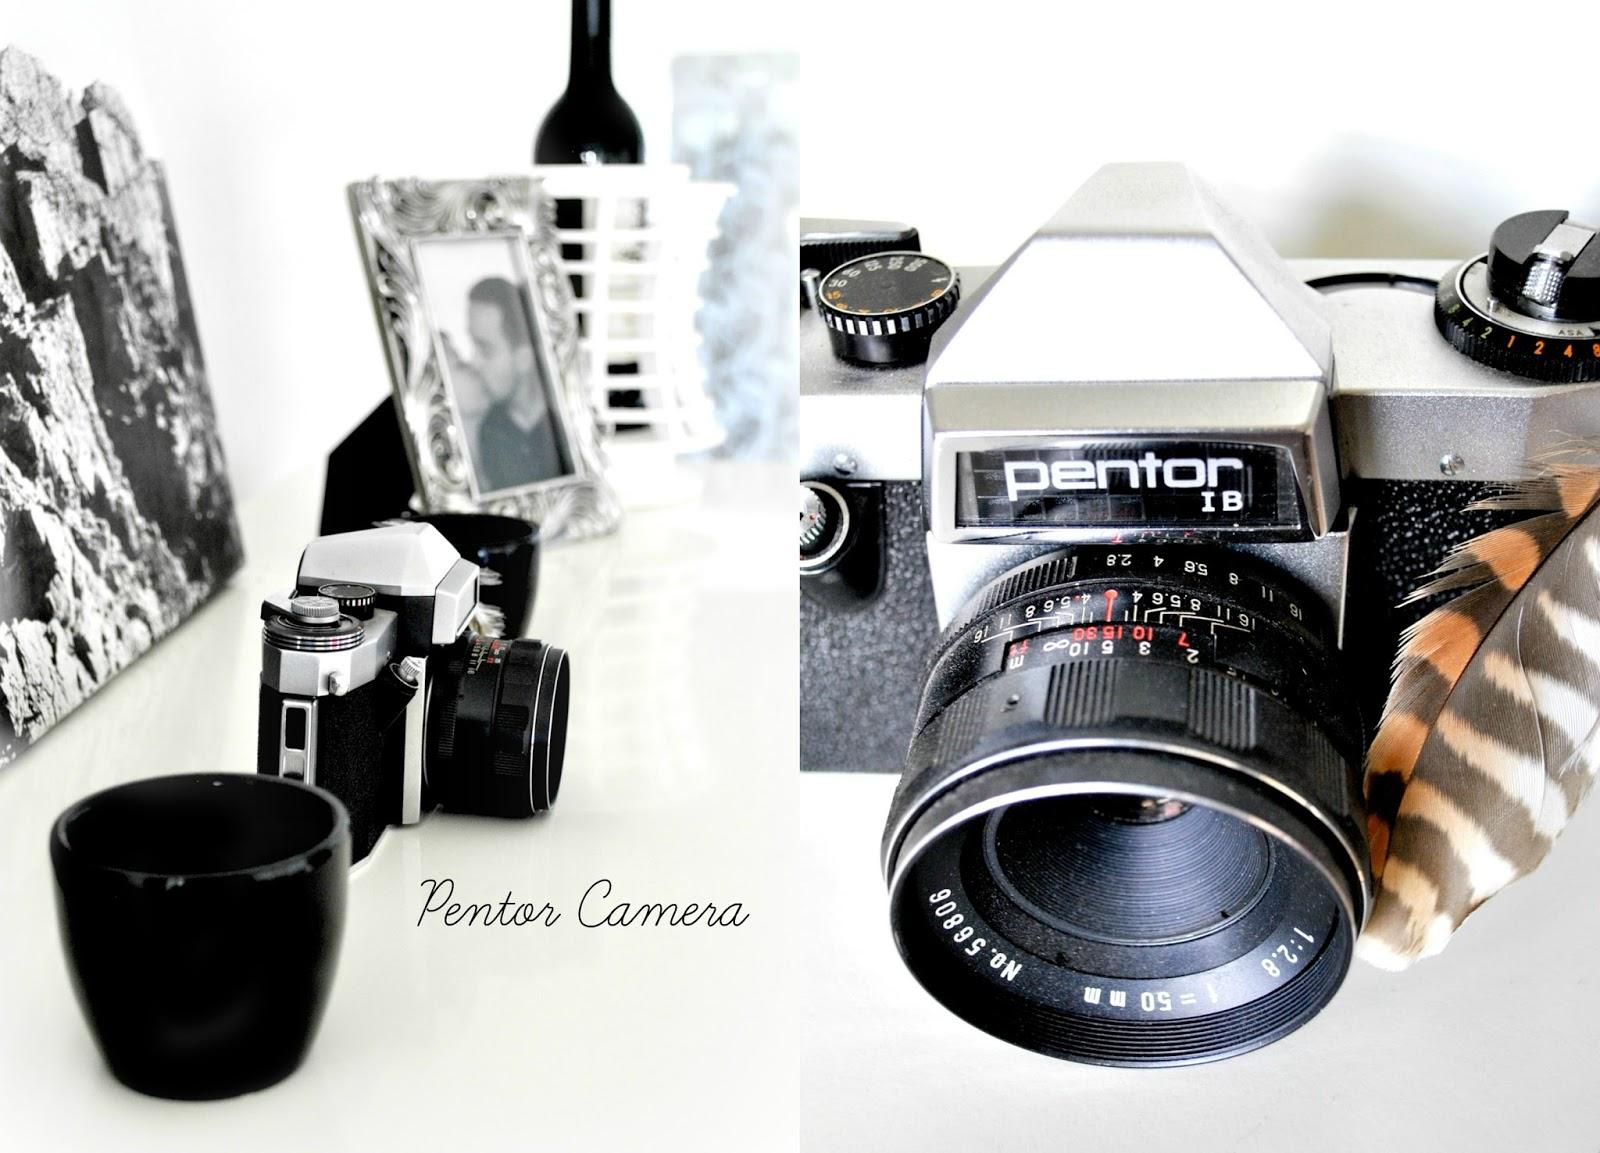 camera pentor